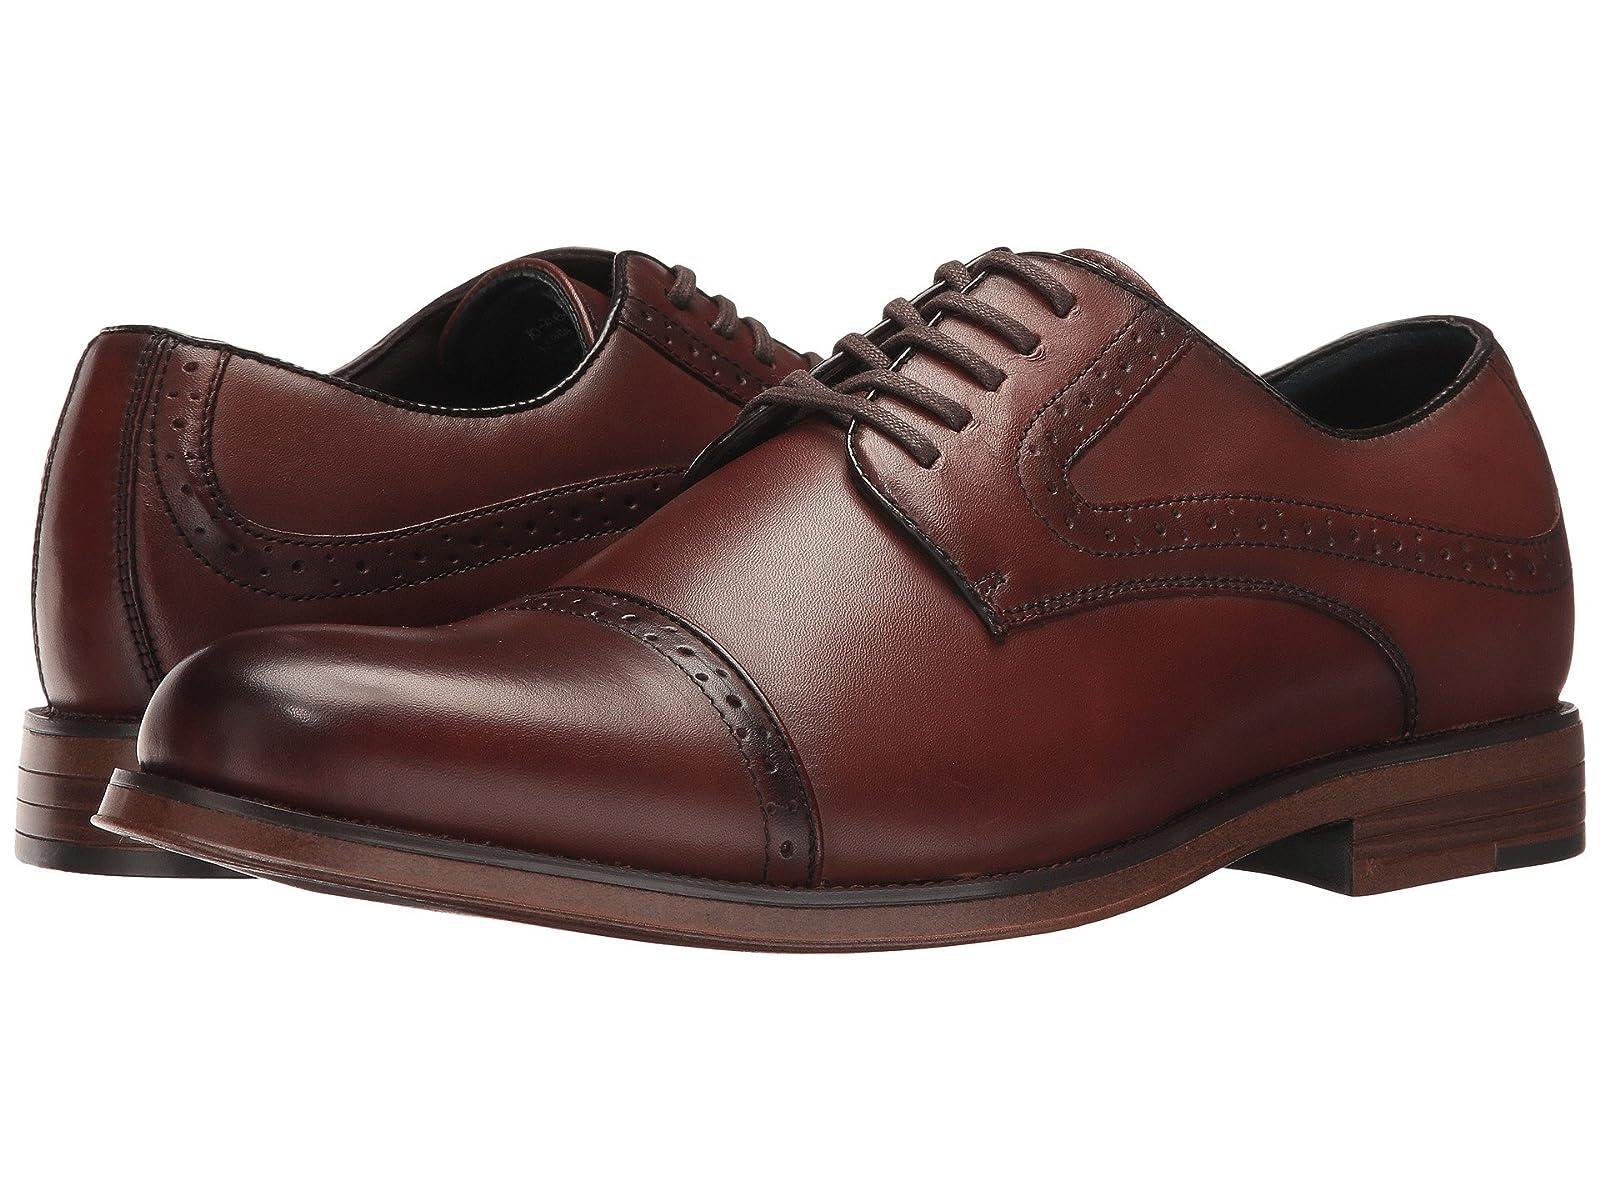 Dockers Bateman Cap Toe OxfordAtmospheric grades have affordable shoes